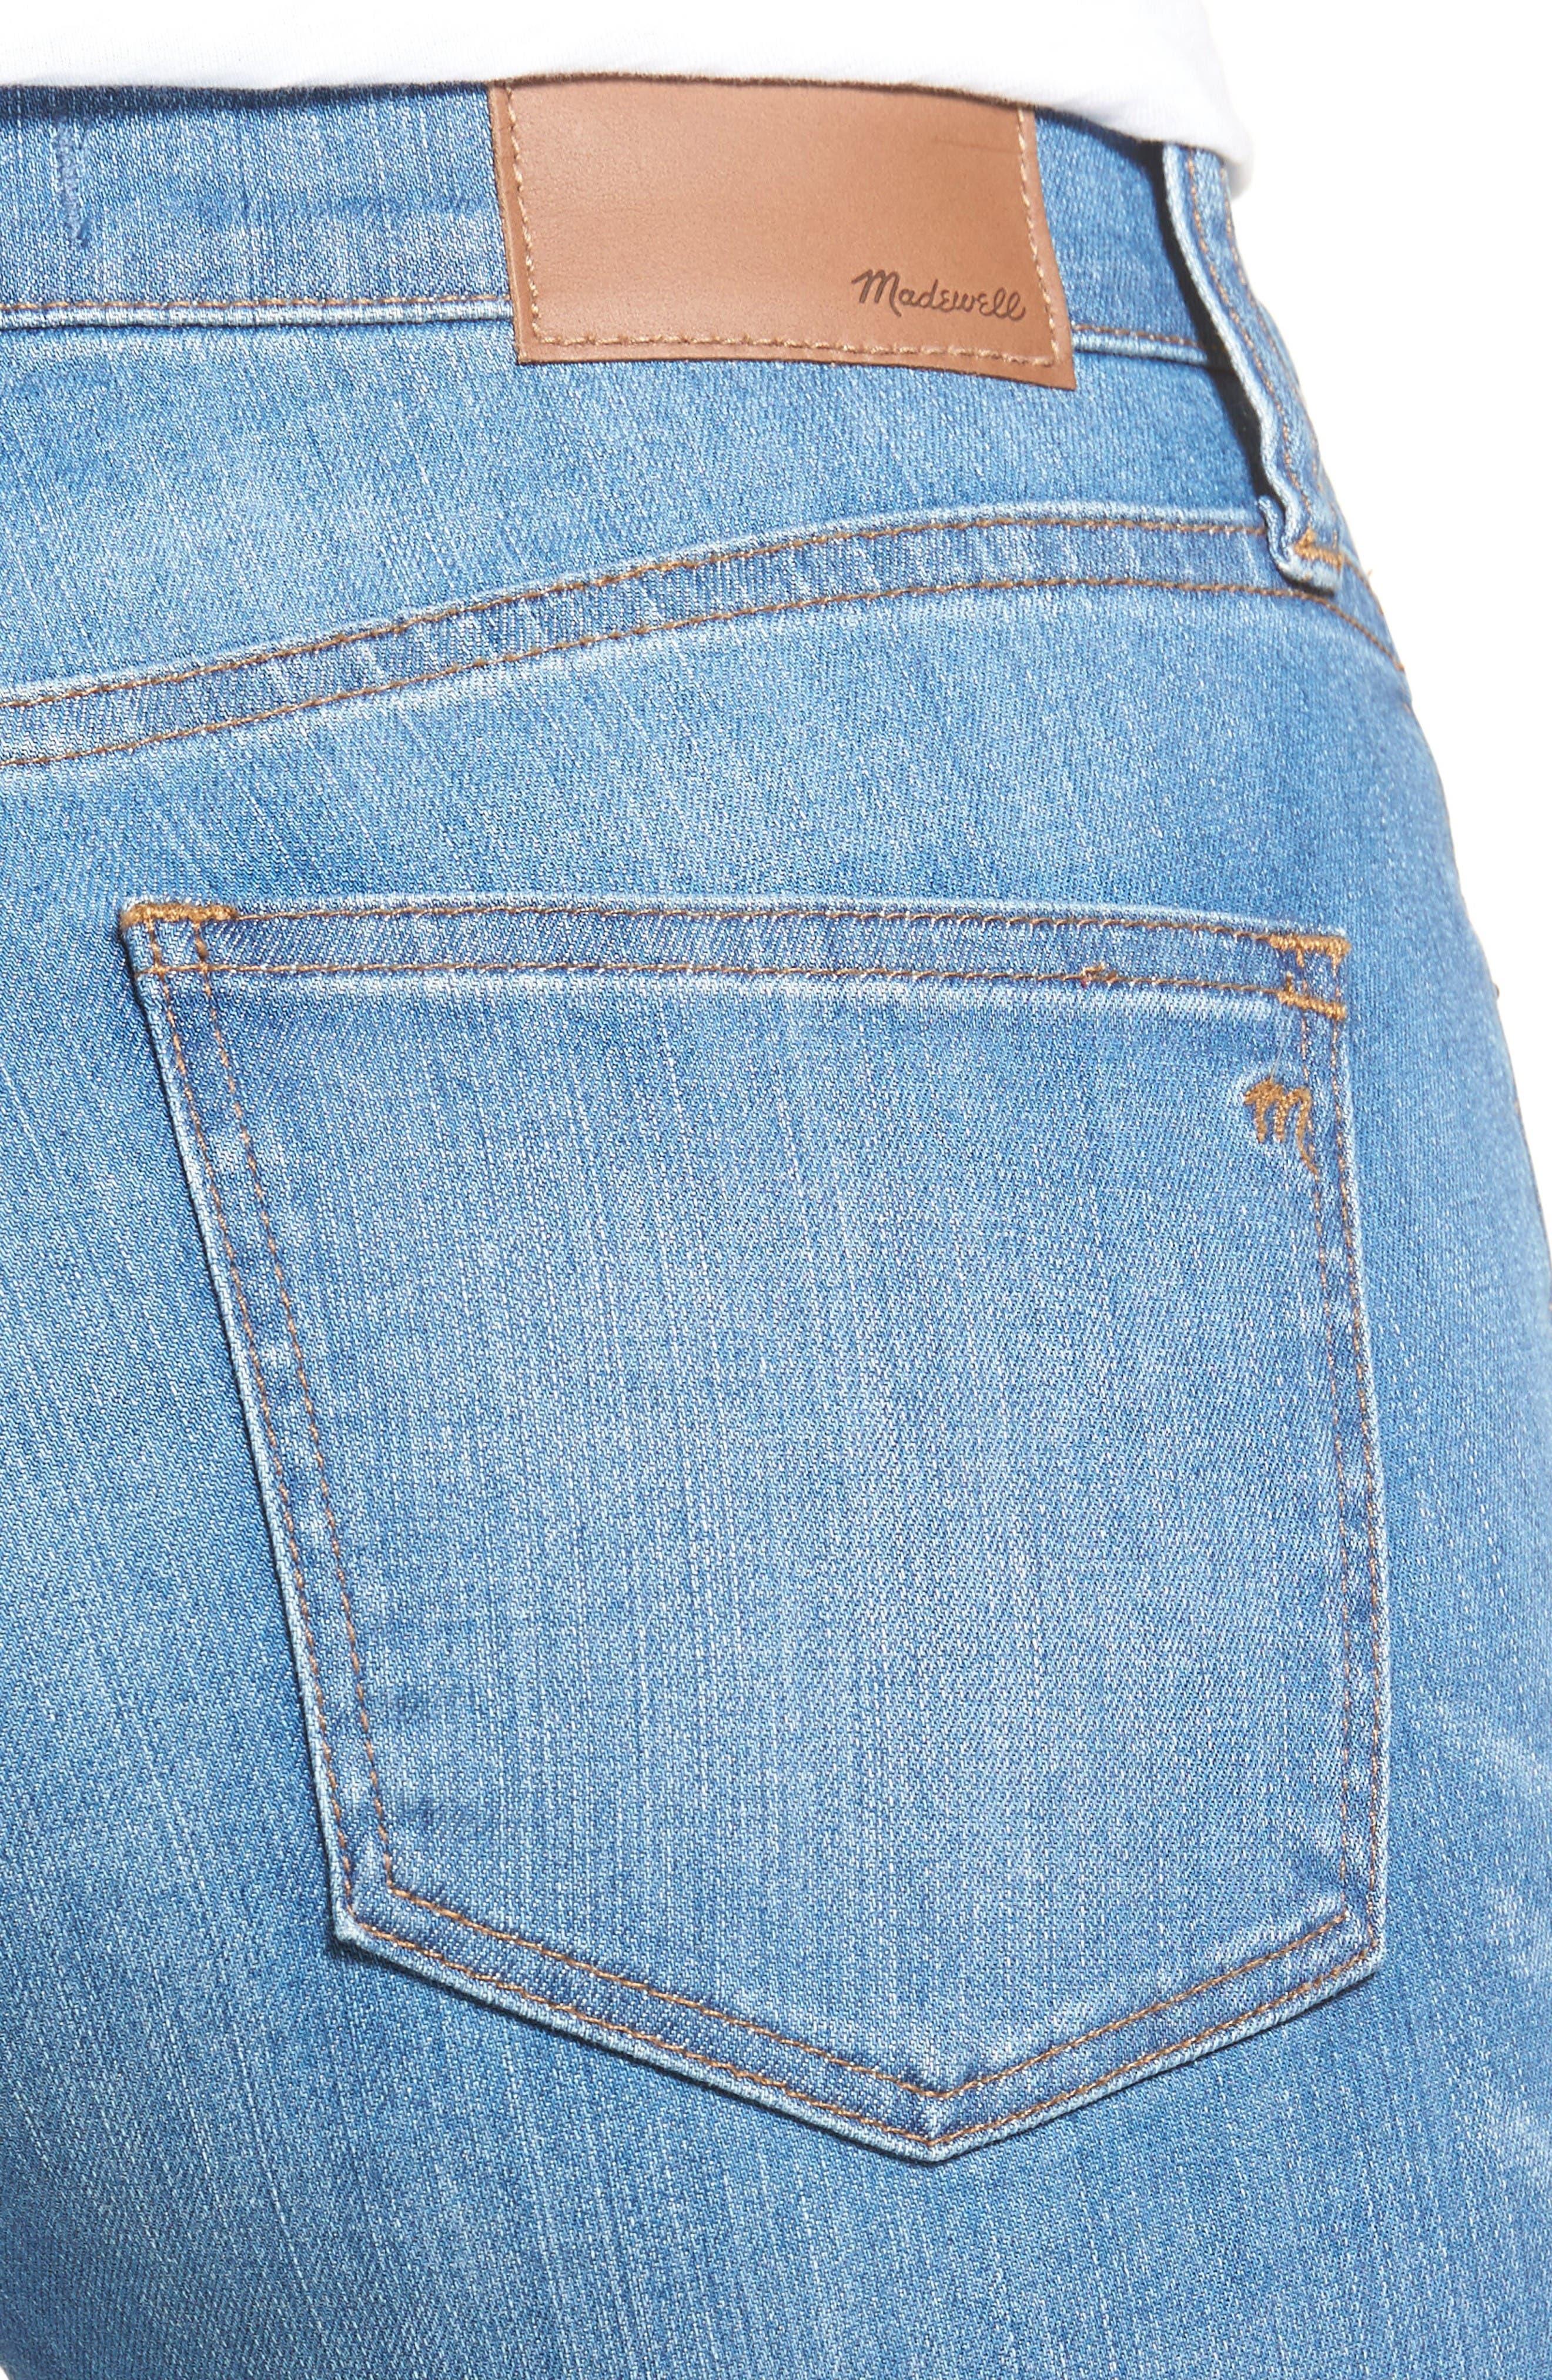 Alternate Image 5  - Madewell Cali Demi Boot Jeans (Fenton Wash)